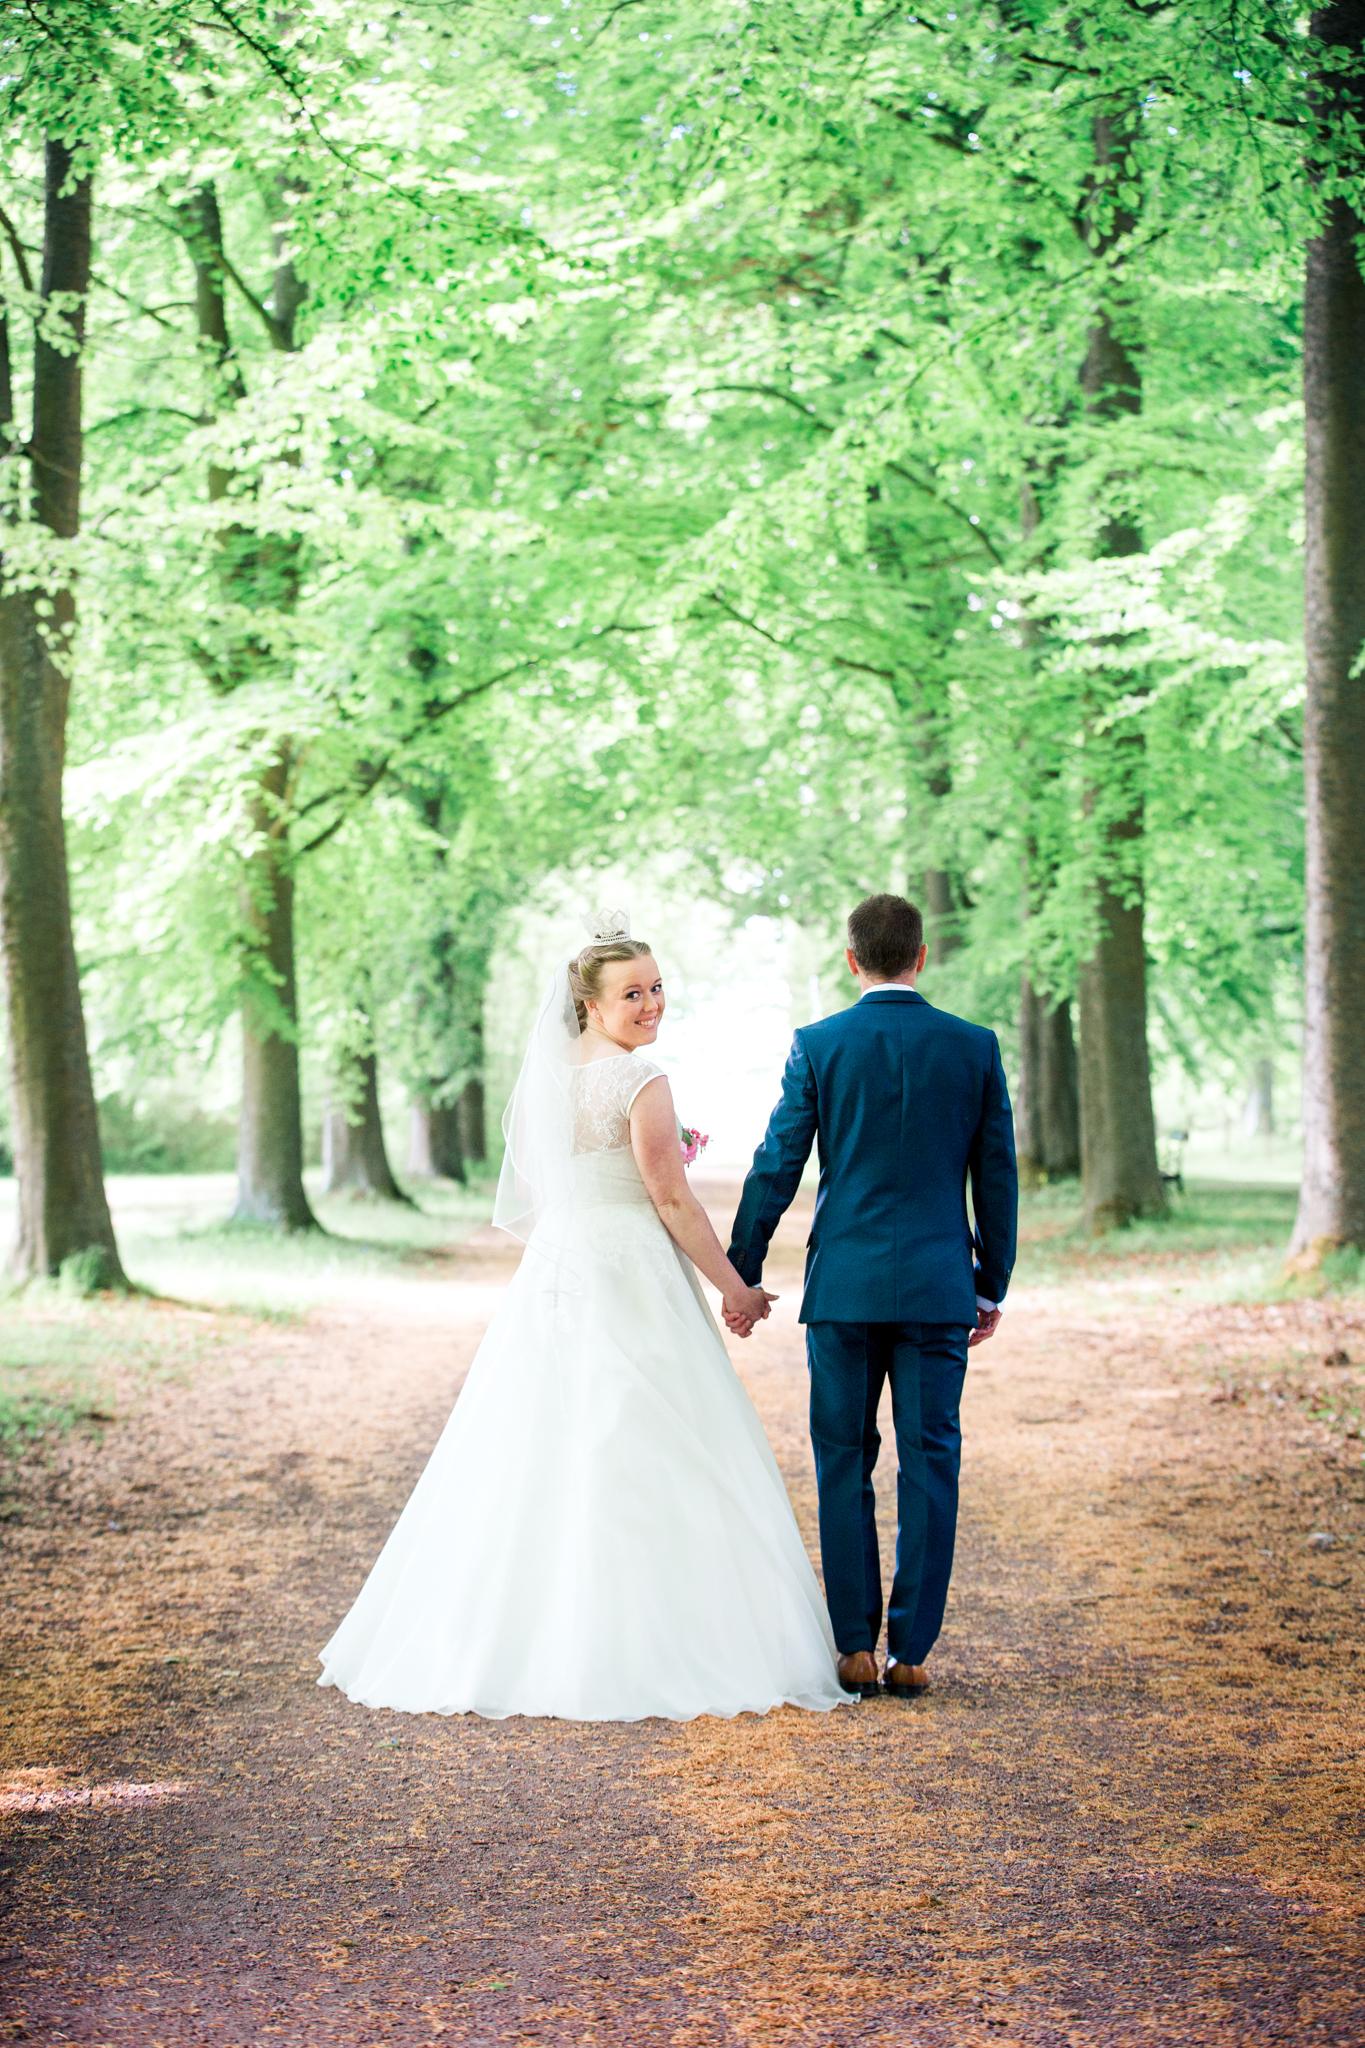 ViOli Photography bröllopsfotograf-Karlshamn-Blekinge-Ronneby-Karlskrona-Sölvesborg-Bromölla-Kristianstad (9 av 35)